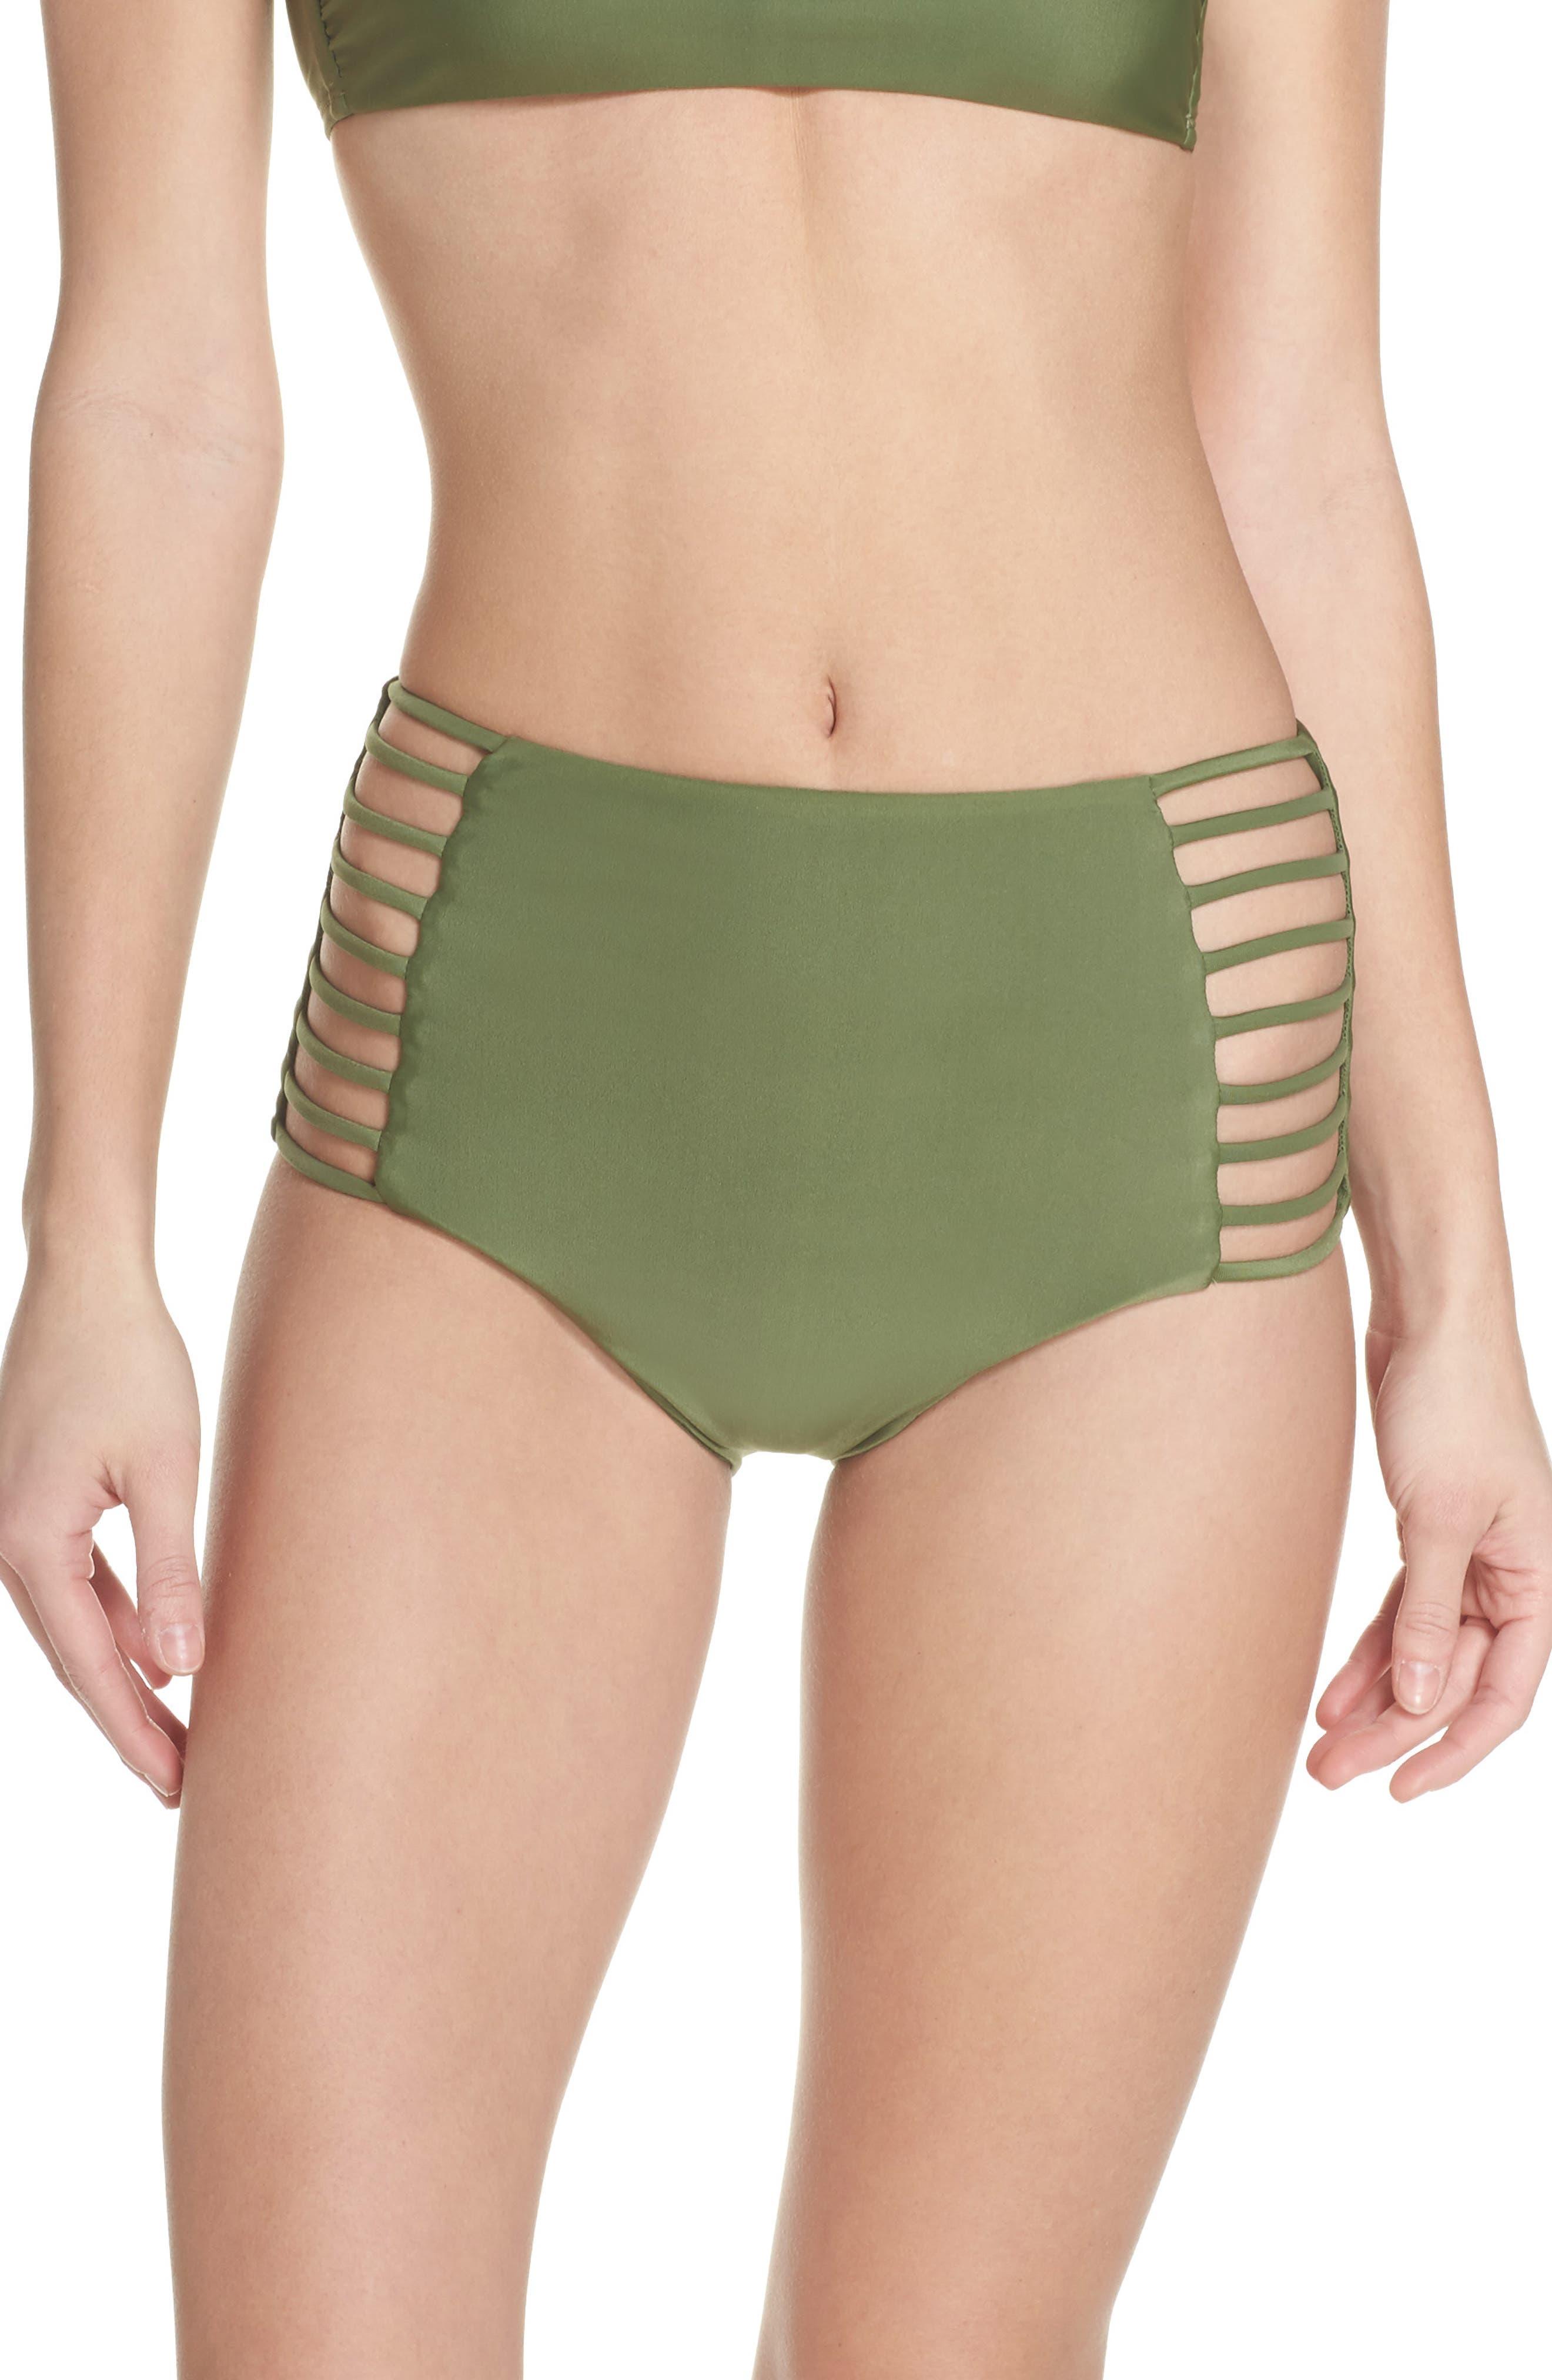 B bikini day pool skirt sleepover th underwear